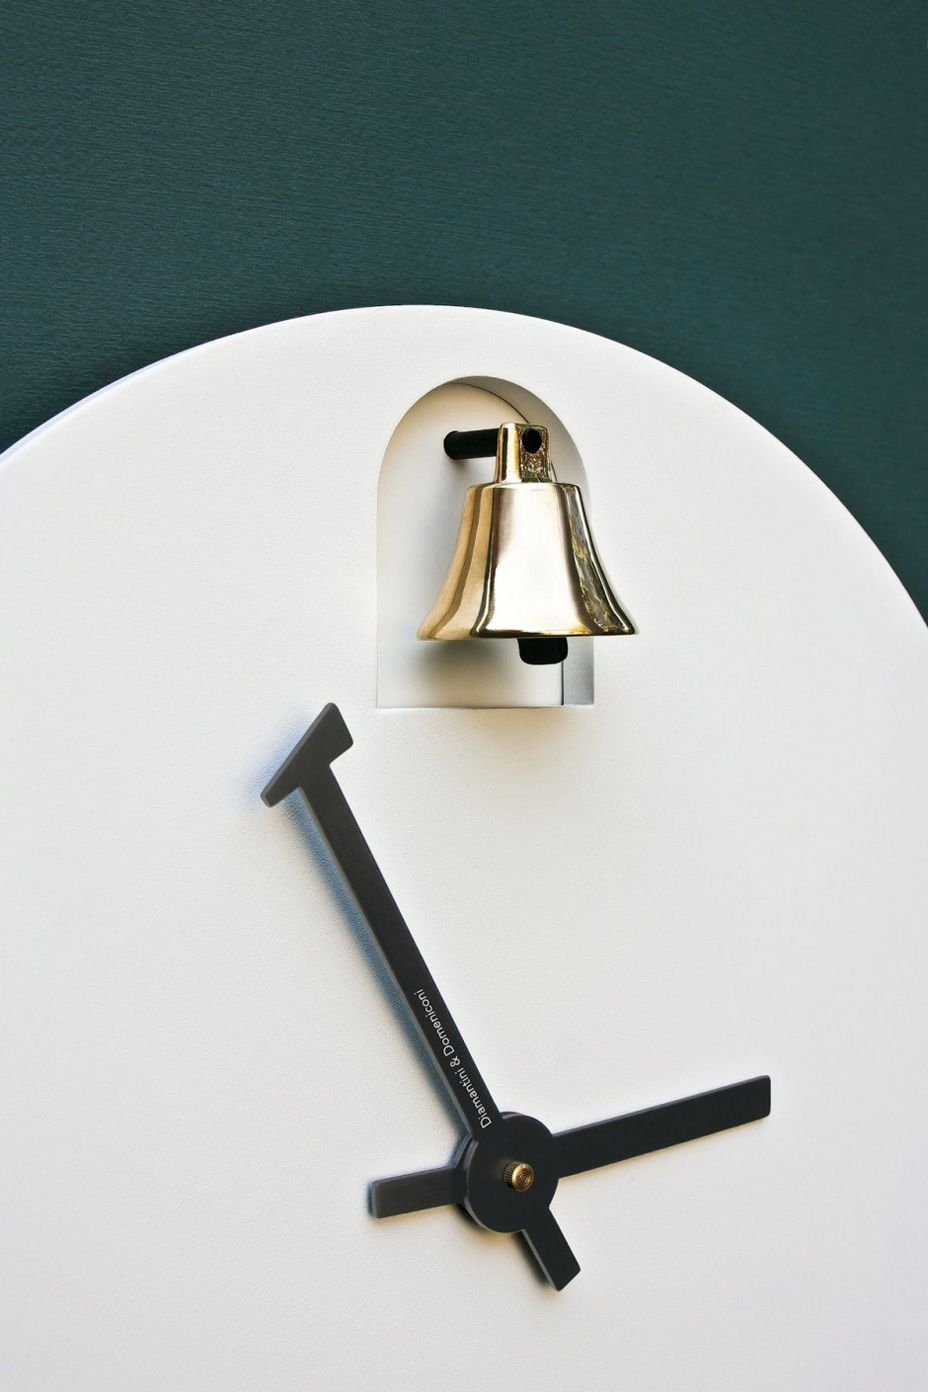 Dinn Wall Clock By Alessandro Zambelli Ideasgn Clock Wall Clock Clock Design